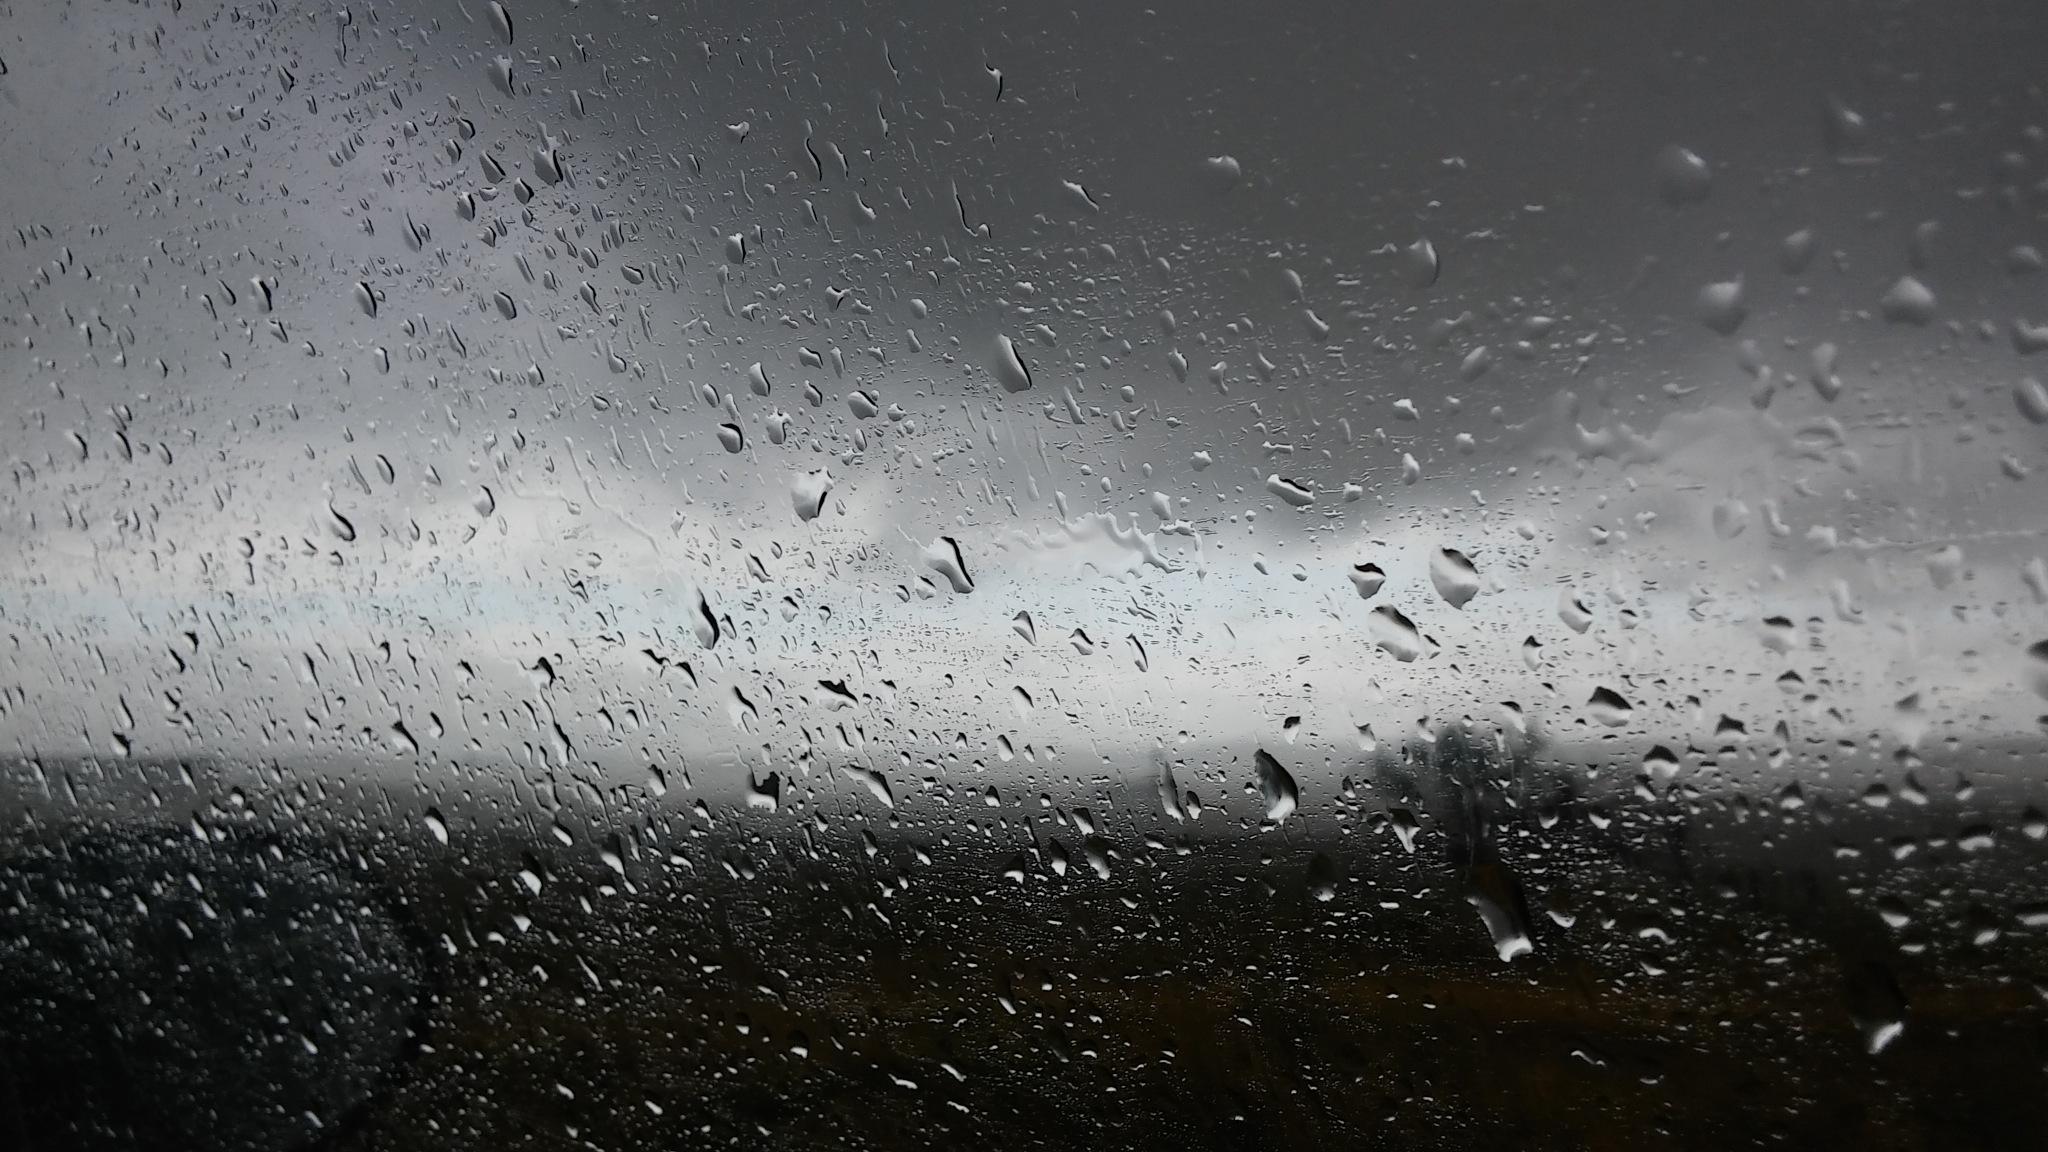 wet chaos by Ricardousherphoto